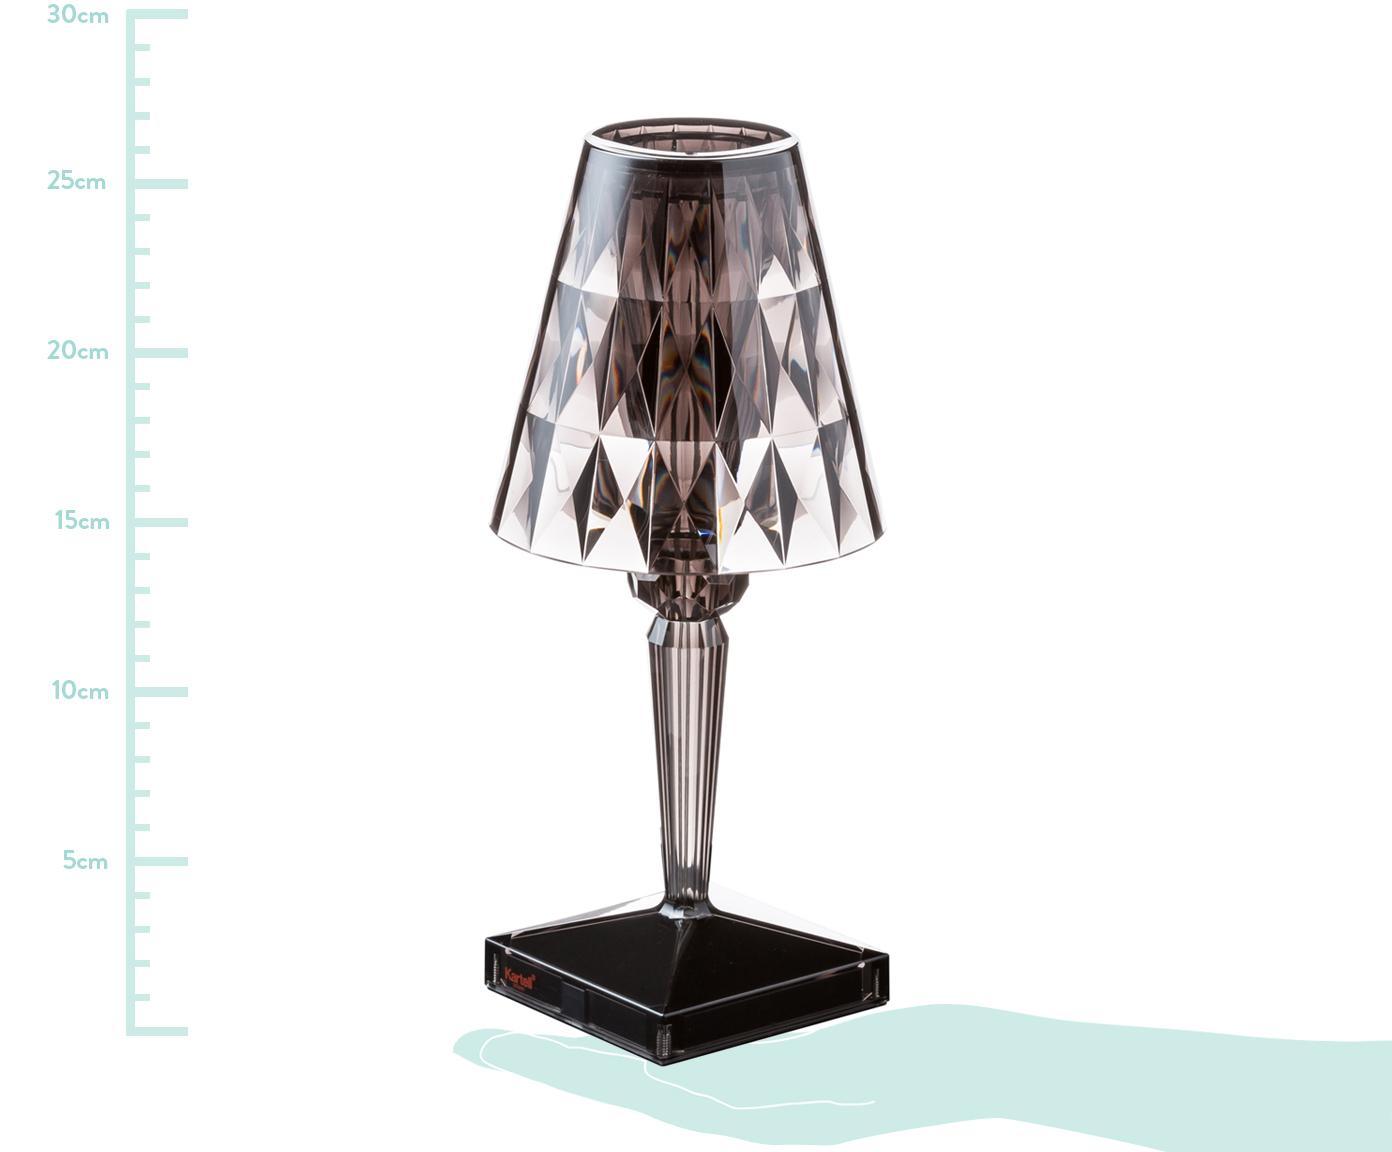 LED tafellamp Battery, Kunststof, Grijs, transparant, Ø 12 x H 26 cm